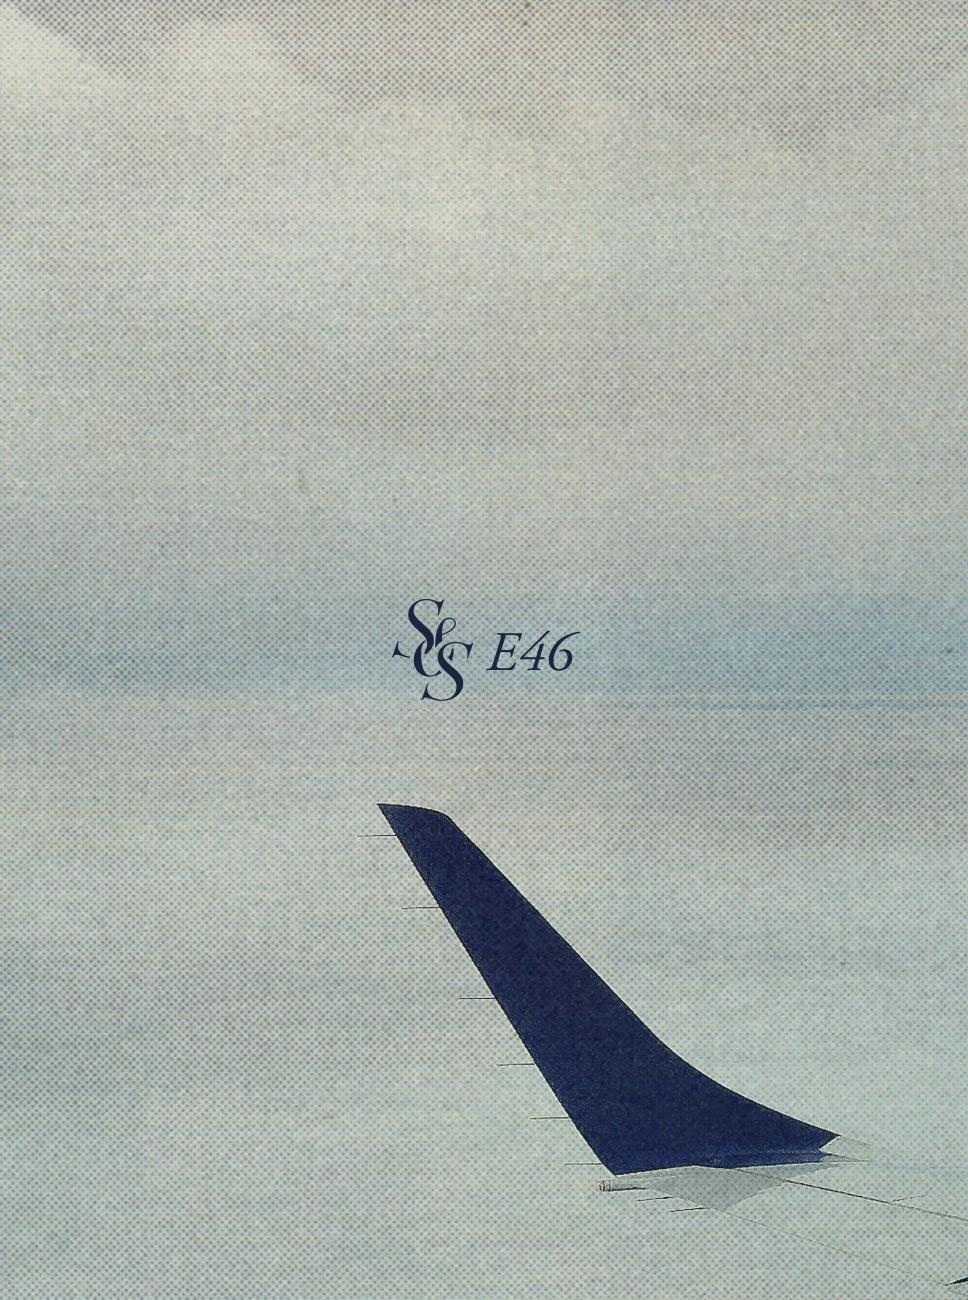 S&S-NewtownRadio-E46